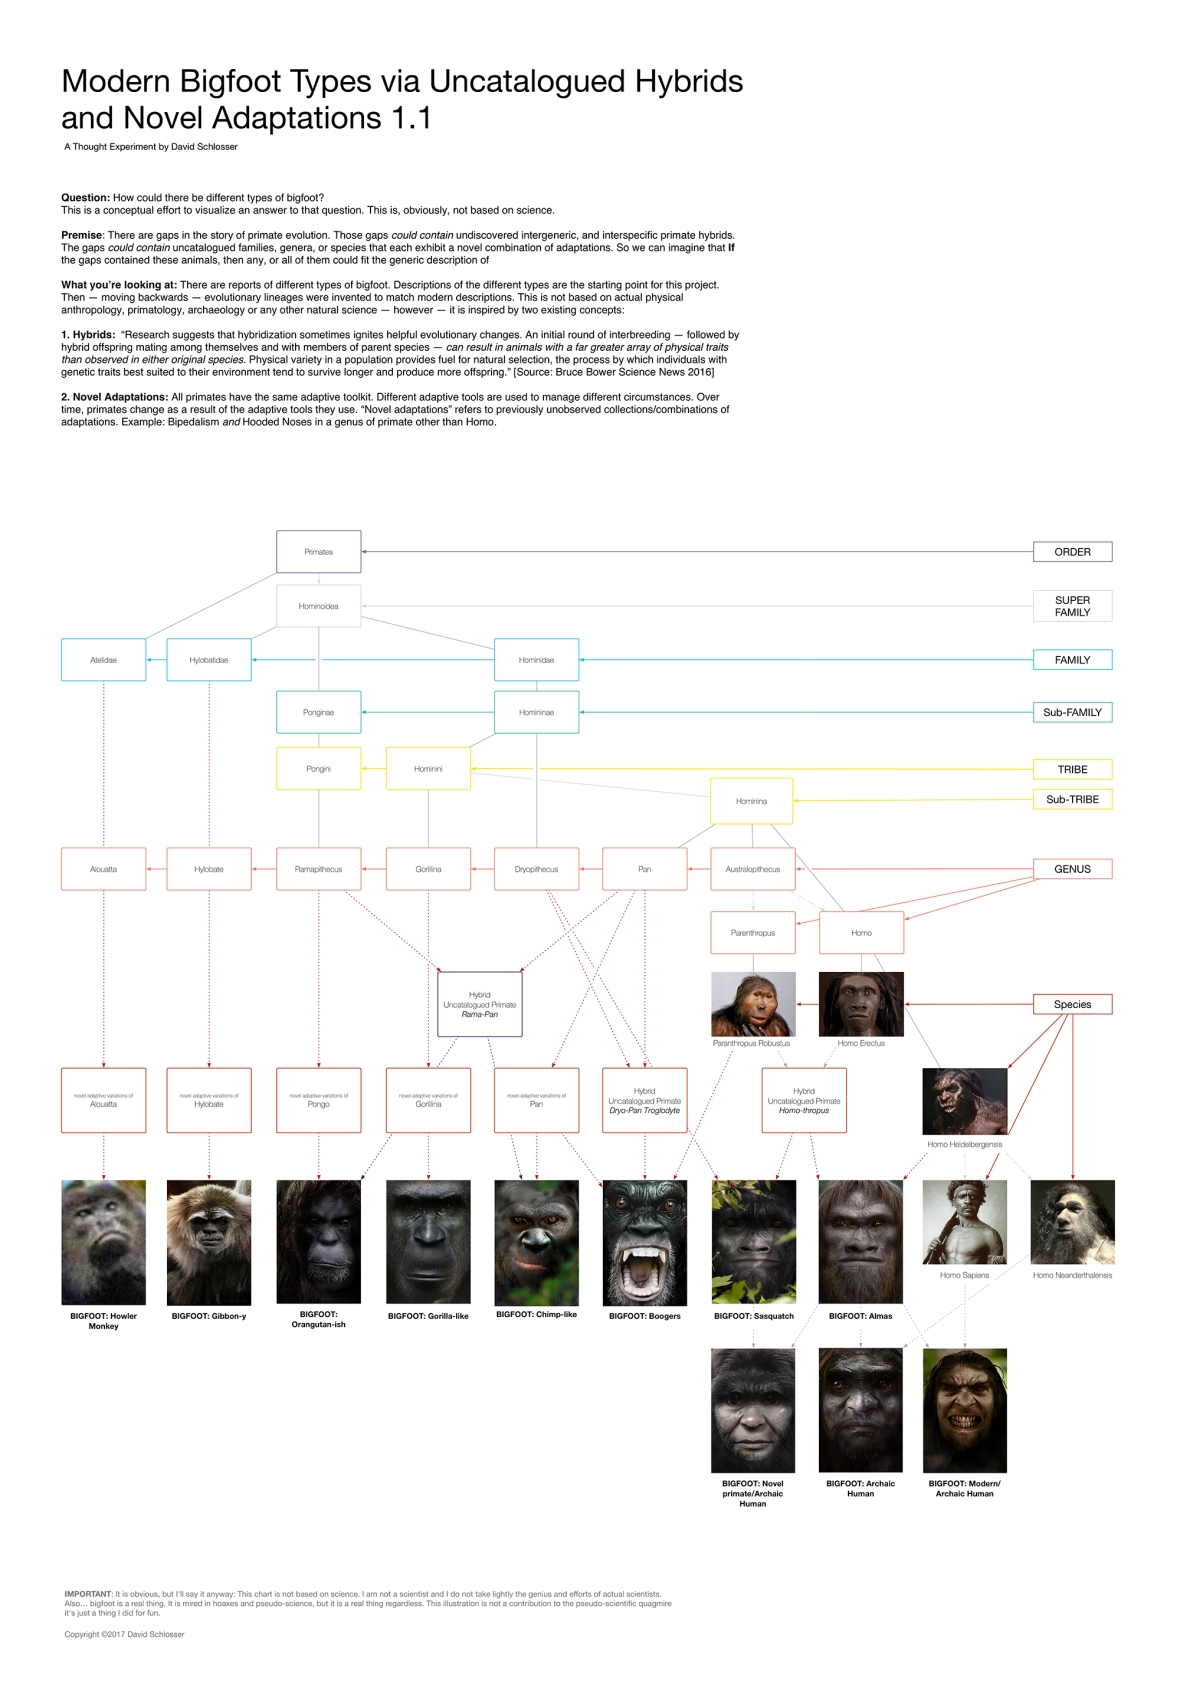 Bigfoot Ancestry